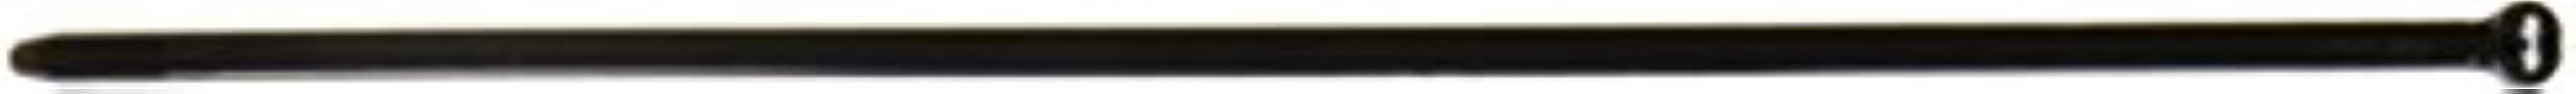 Ty-Rap TY27MX Cable Tie 120 lb. 13